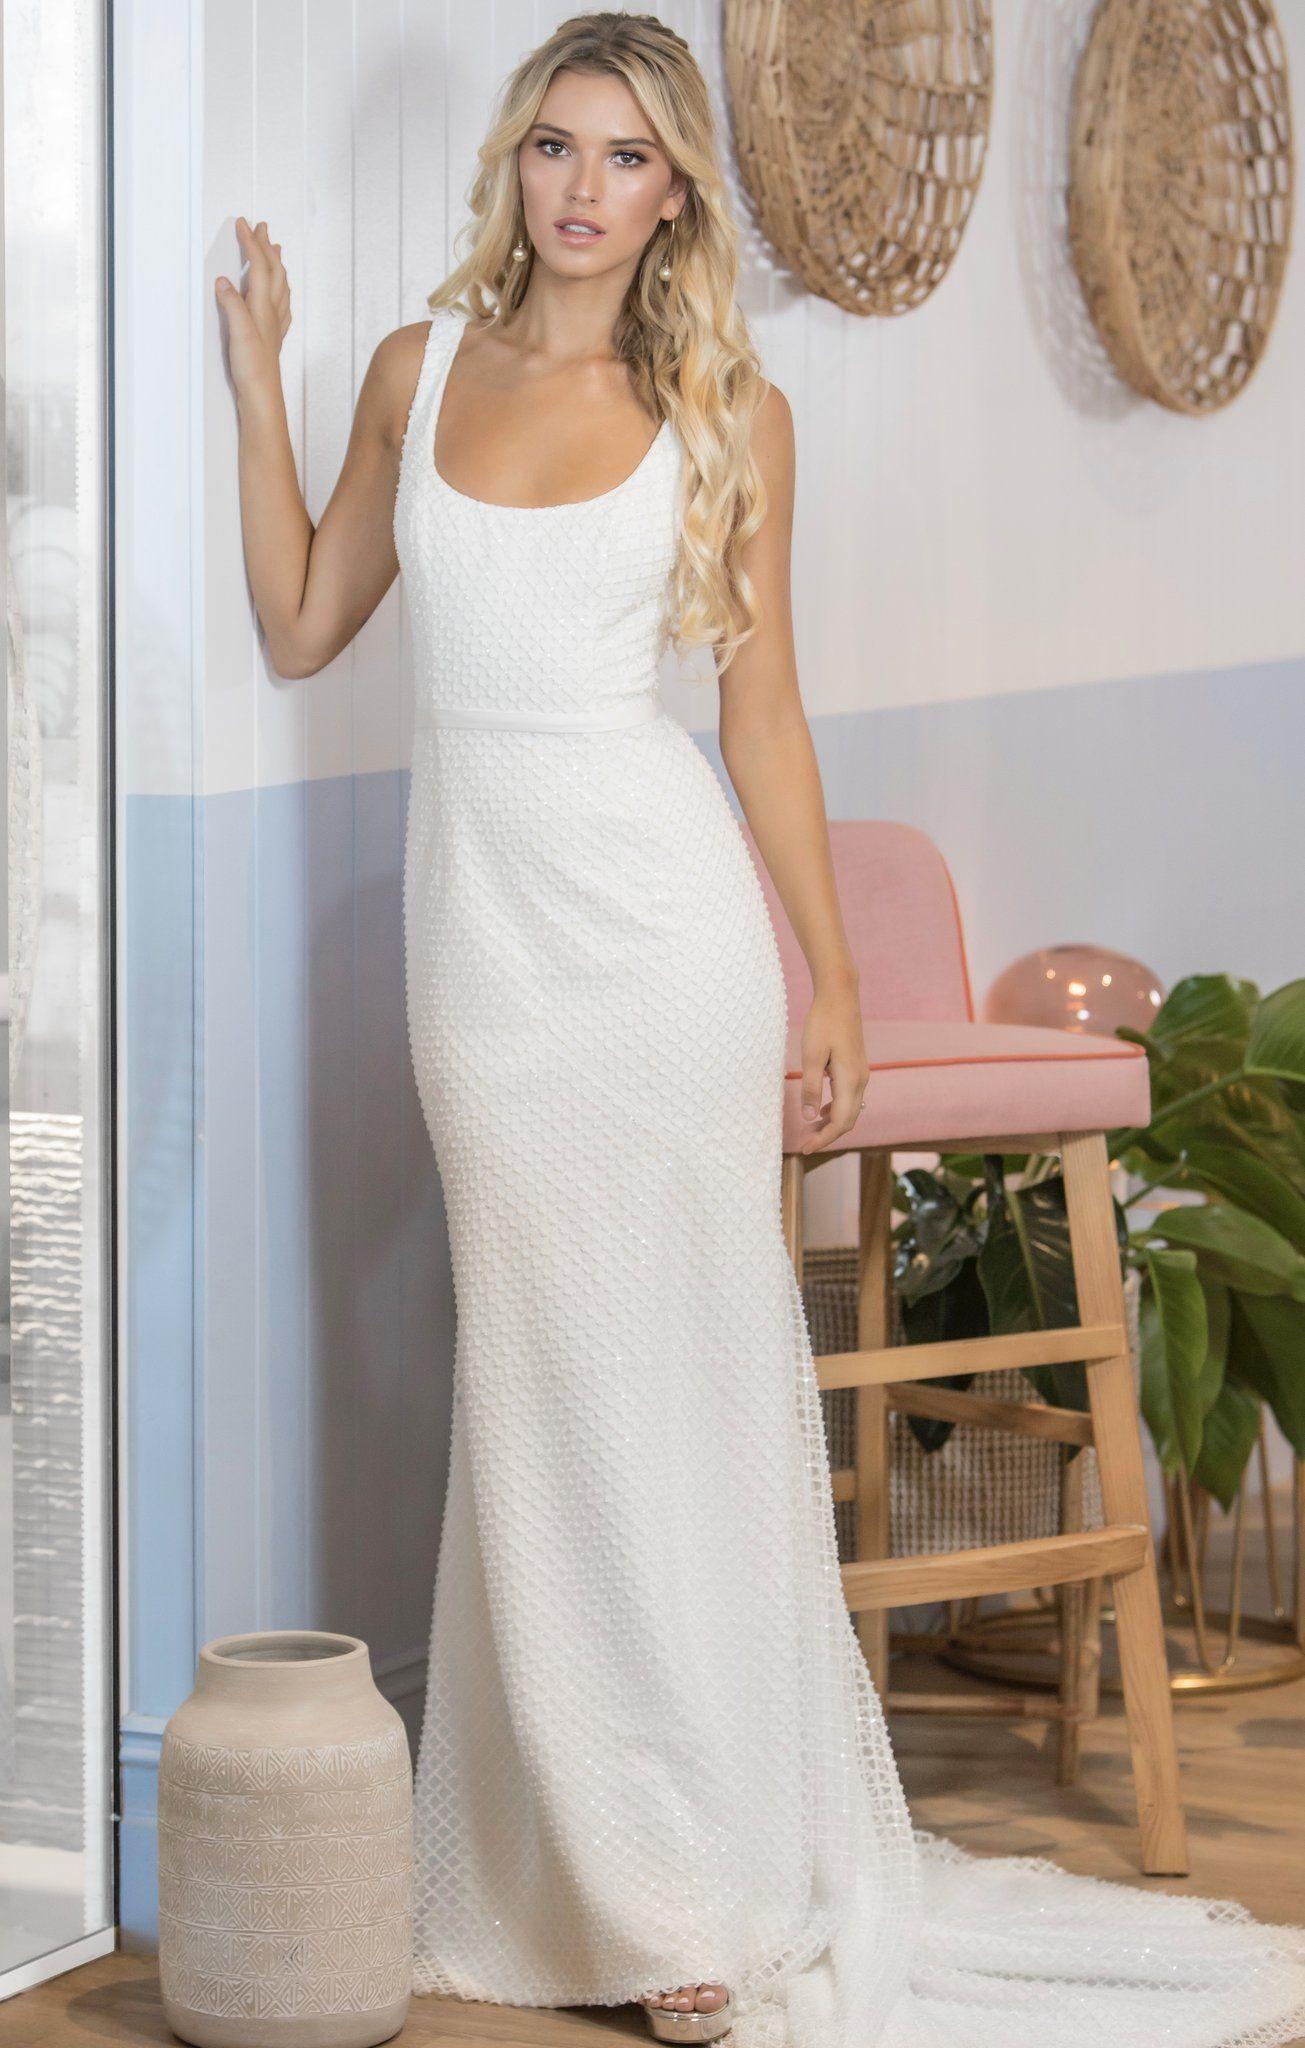 Brigitte bridal gown inspiration wedding dress trends